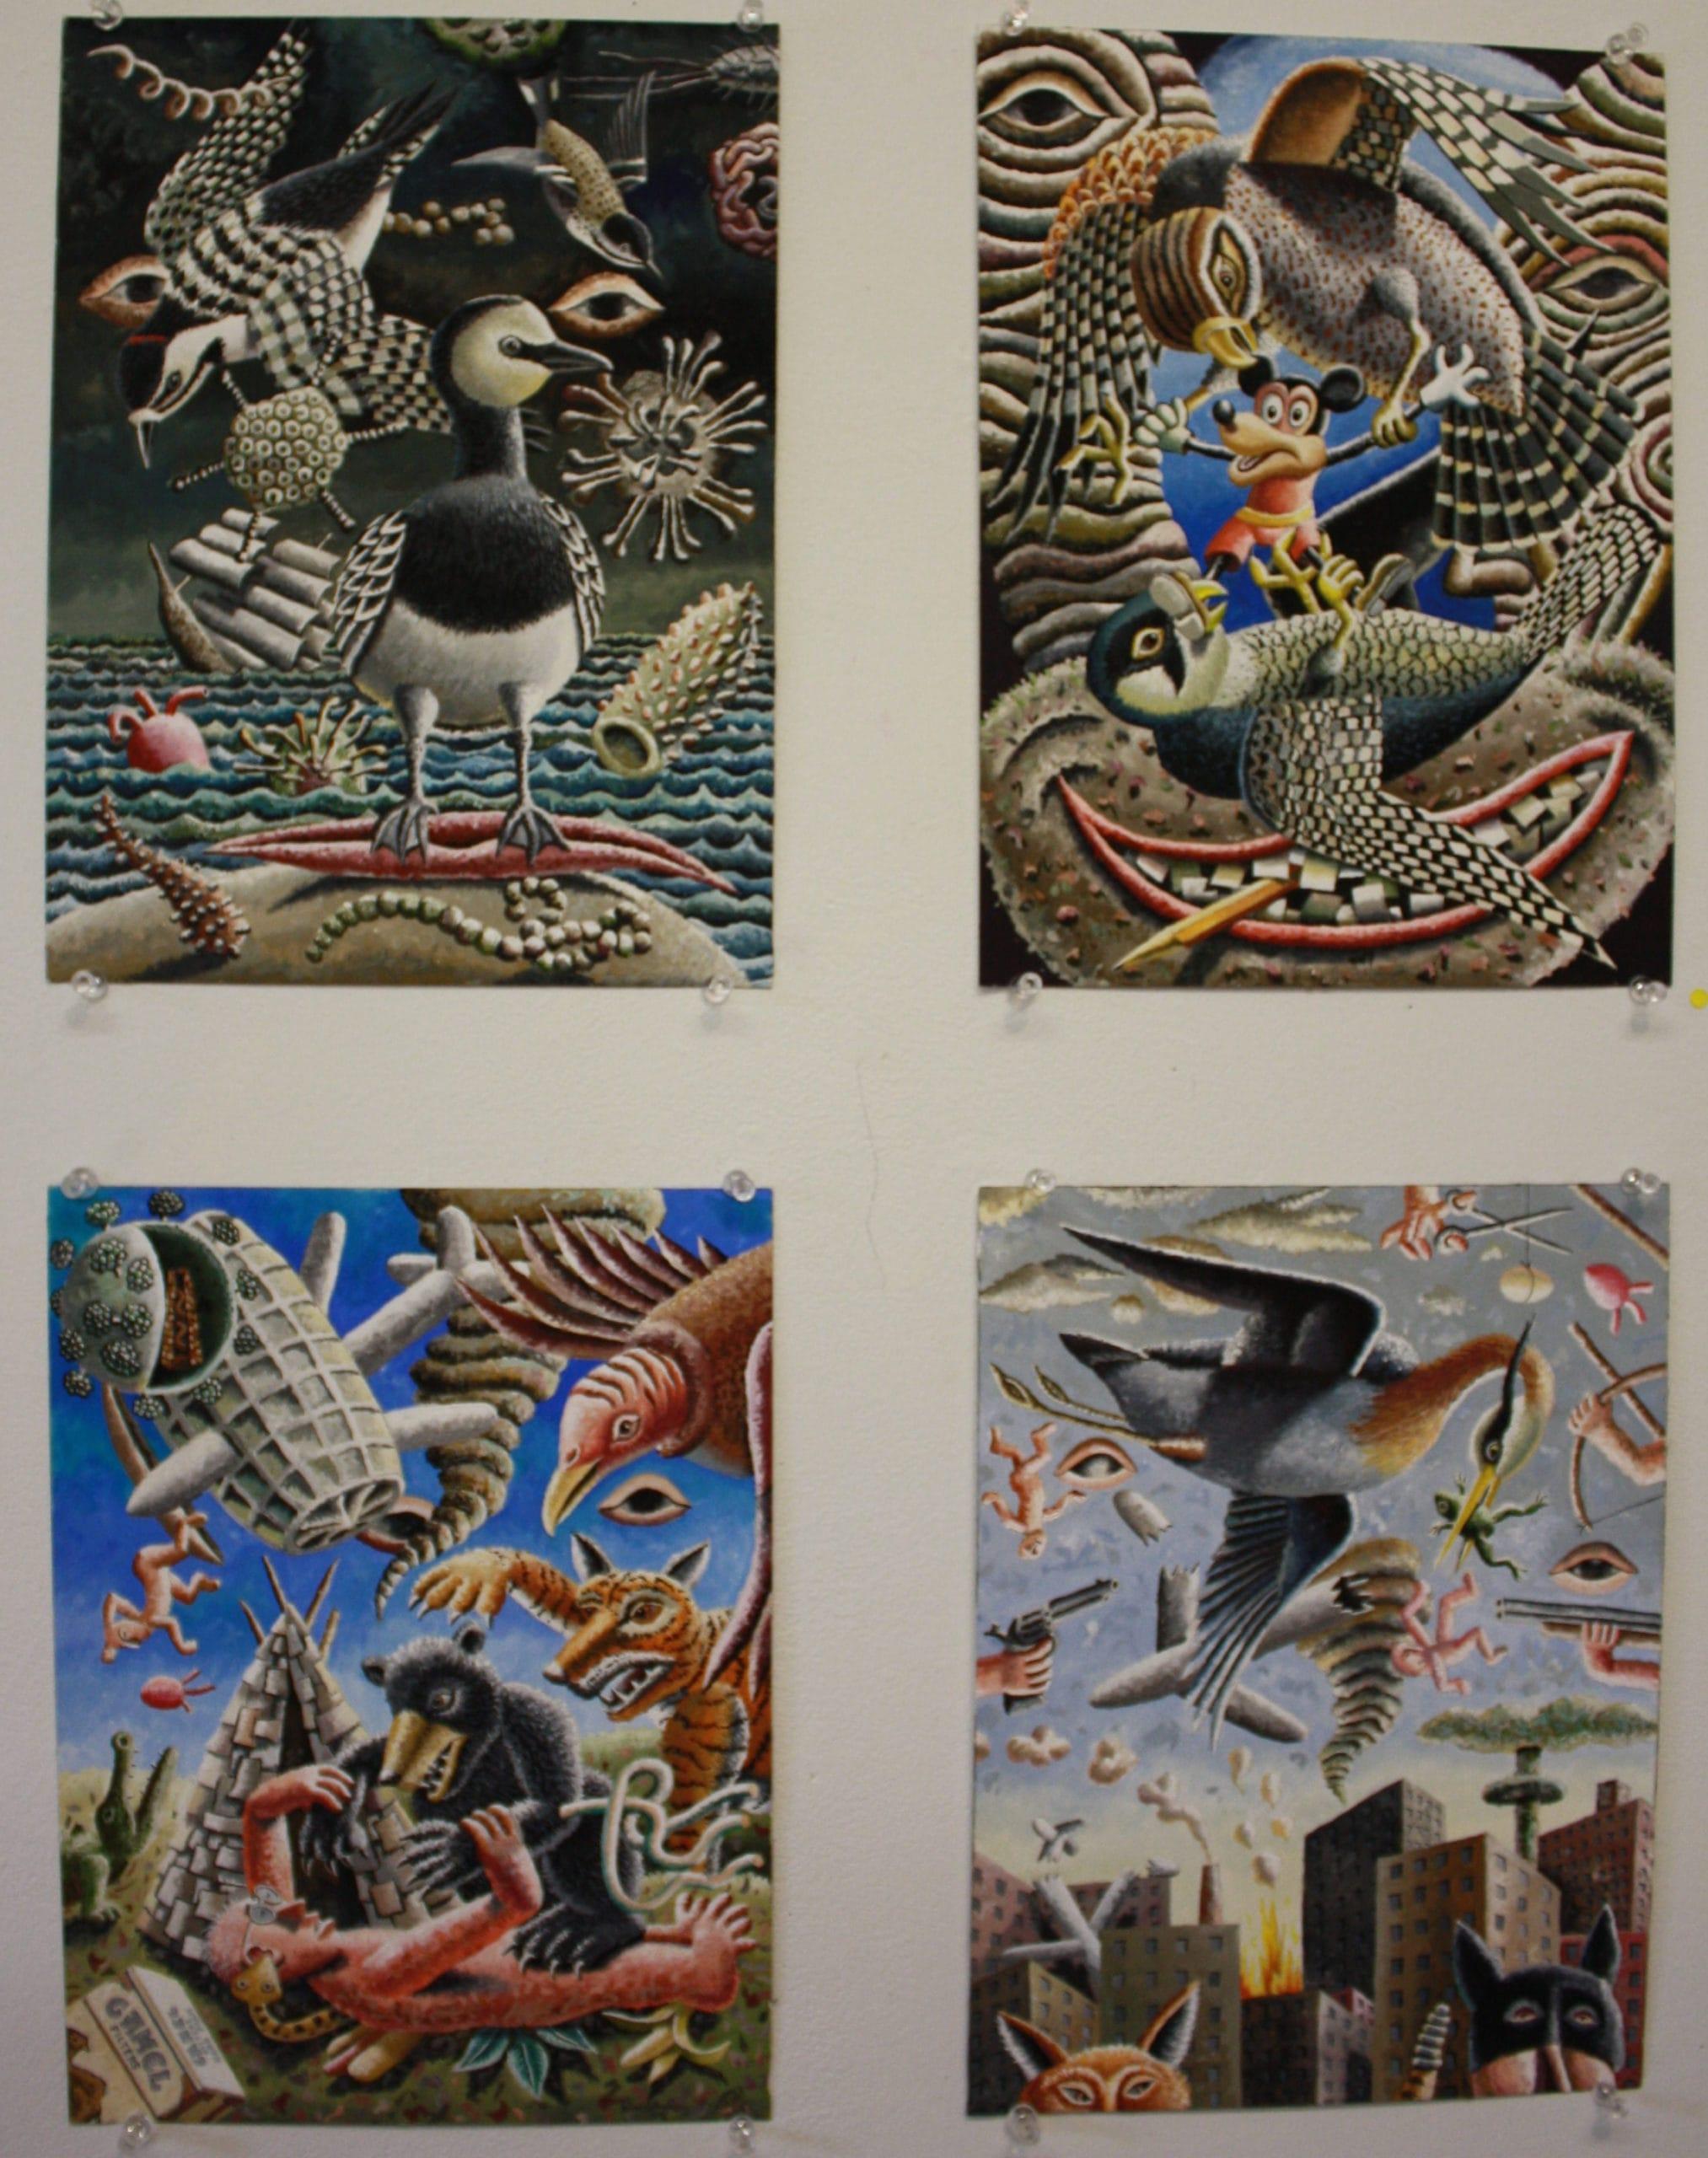 'Disaster 1-4, by Morgan Bulkeley